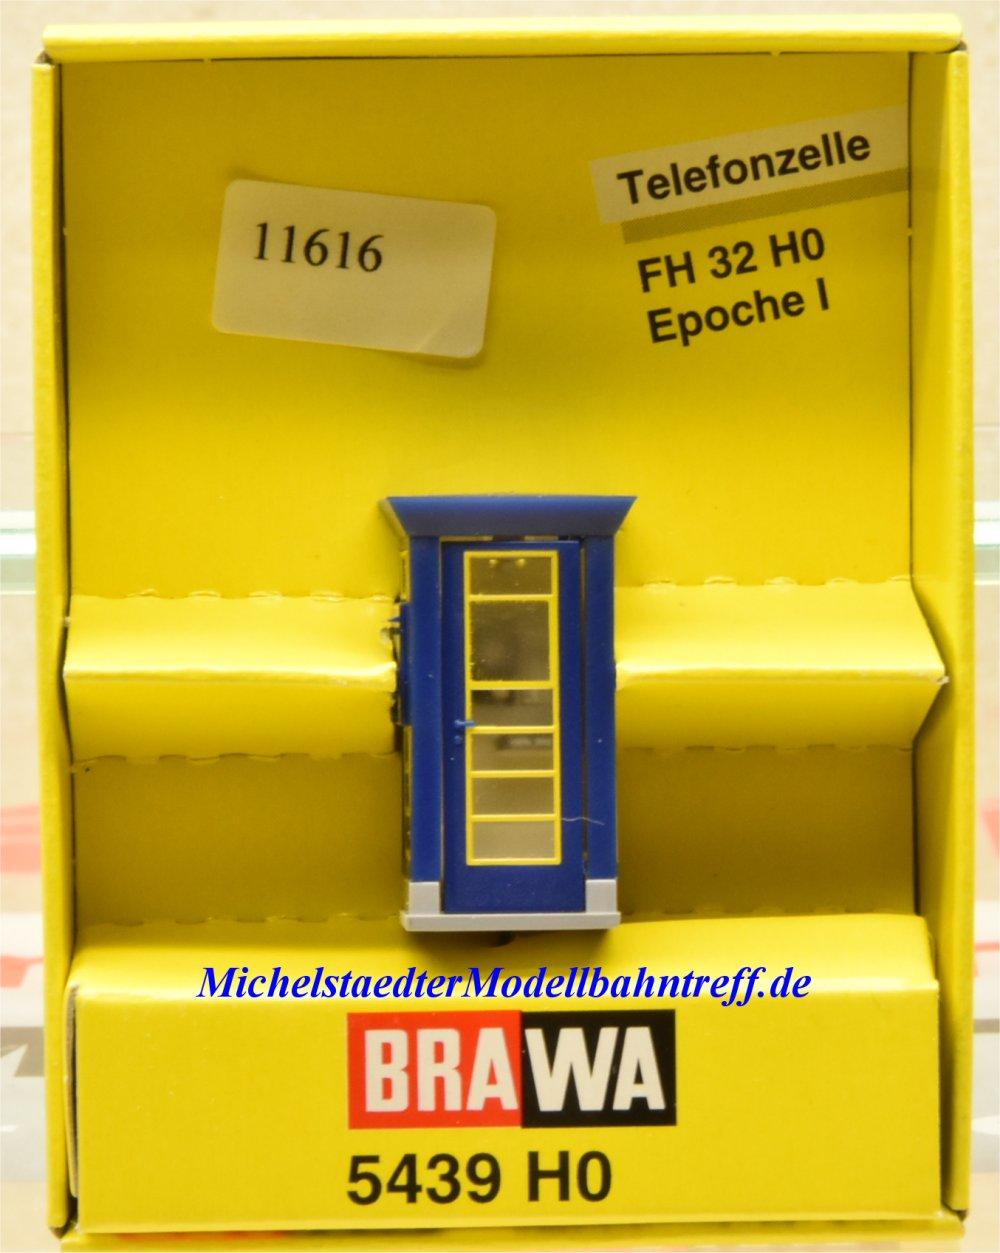 Blau H0 BRAWA 5439 Telefonzelle Typ FH 32